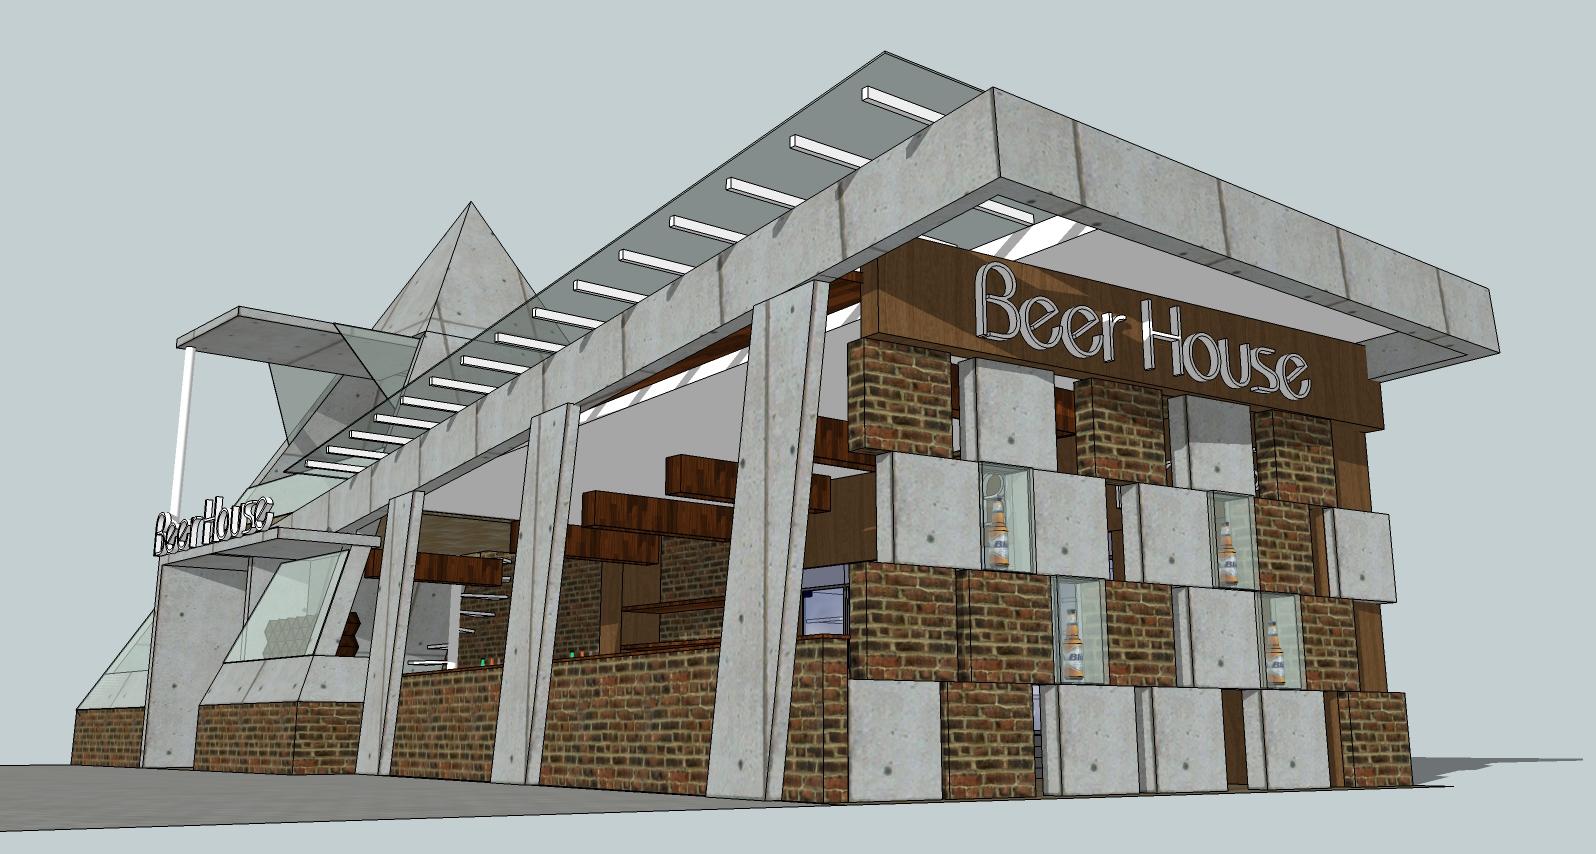 Jasa Kontraktor Rumah Bandung - Beer House Ranggaganding